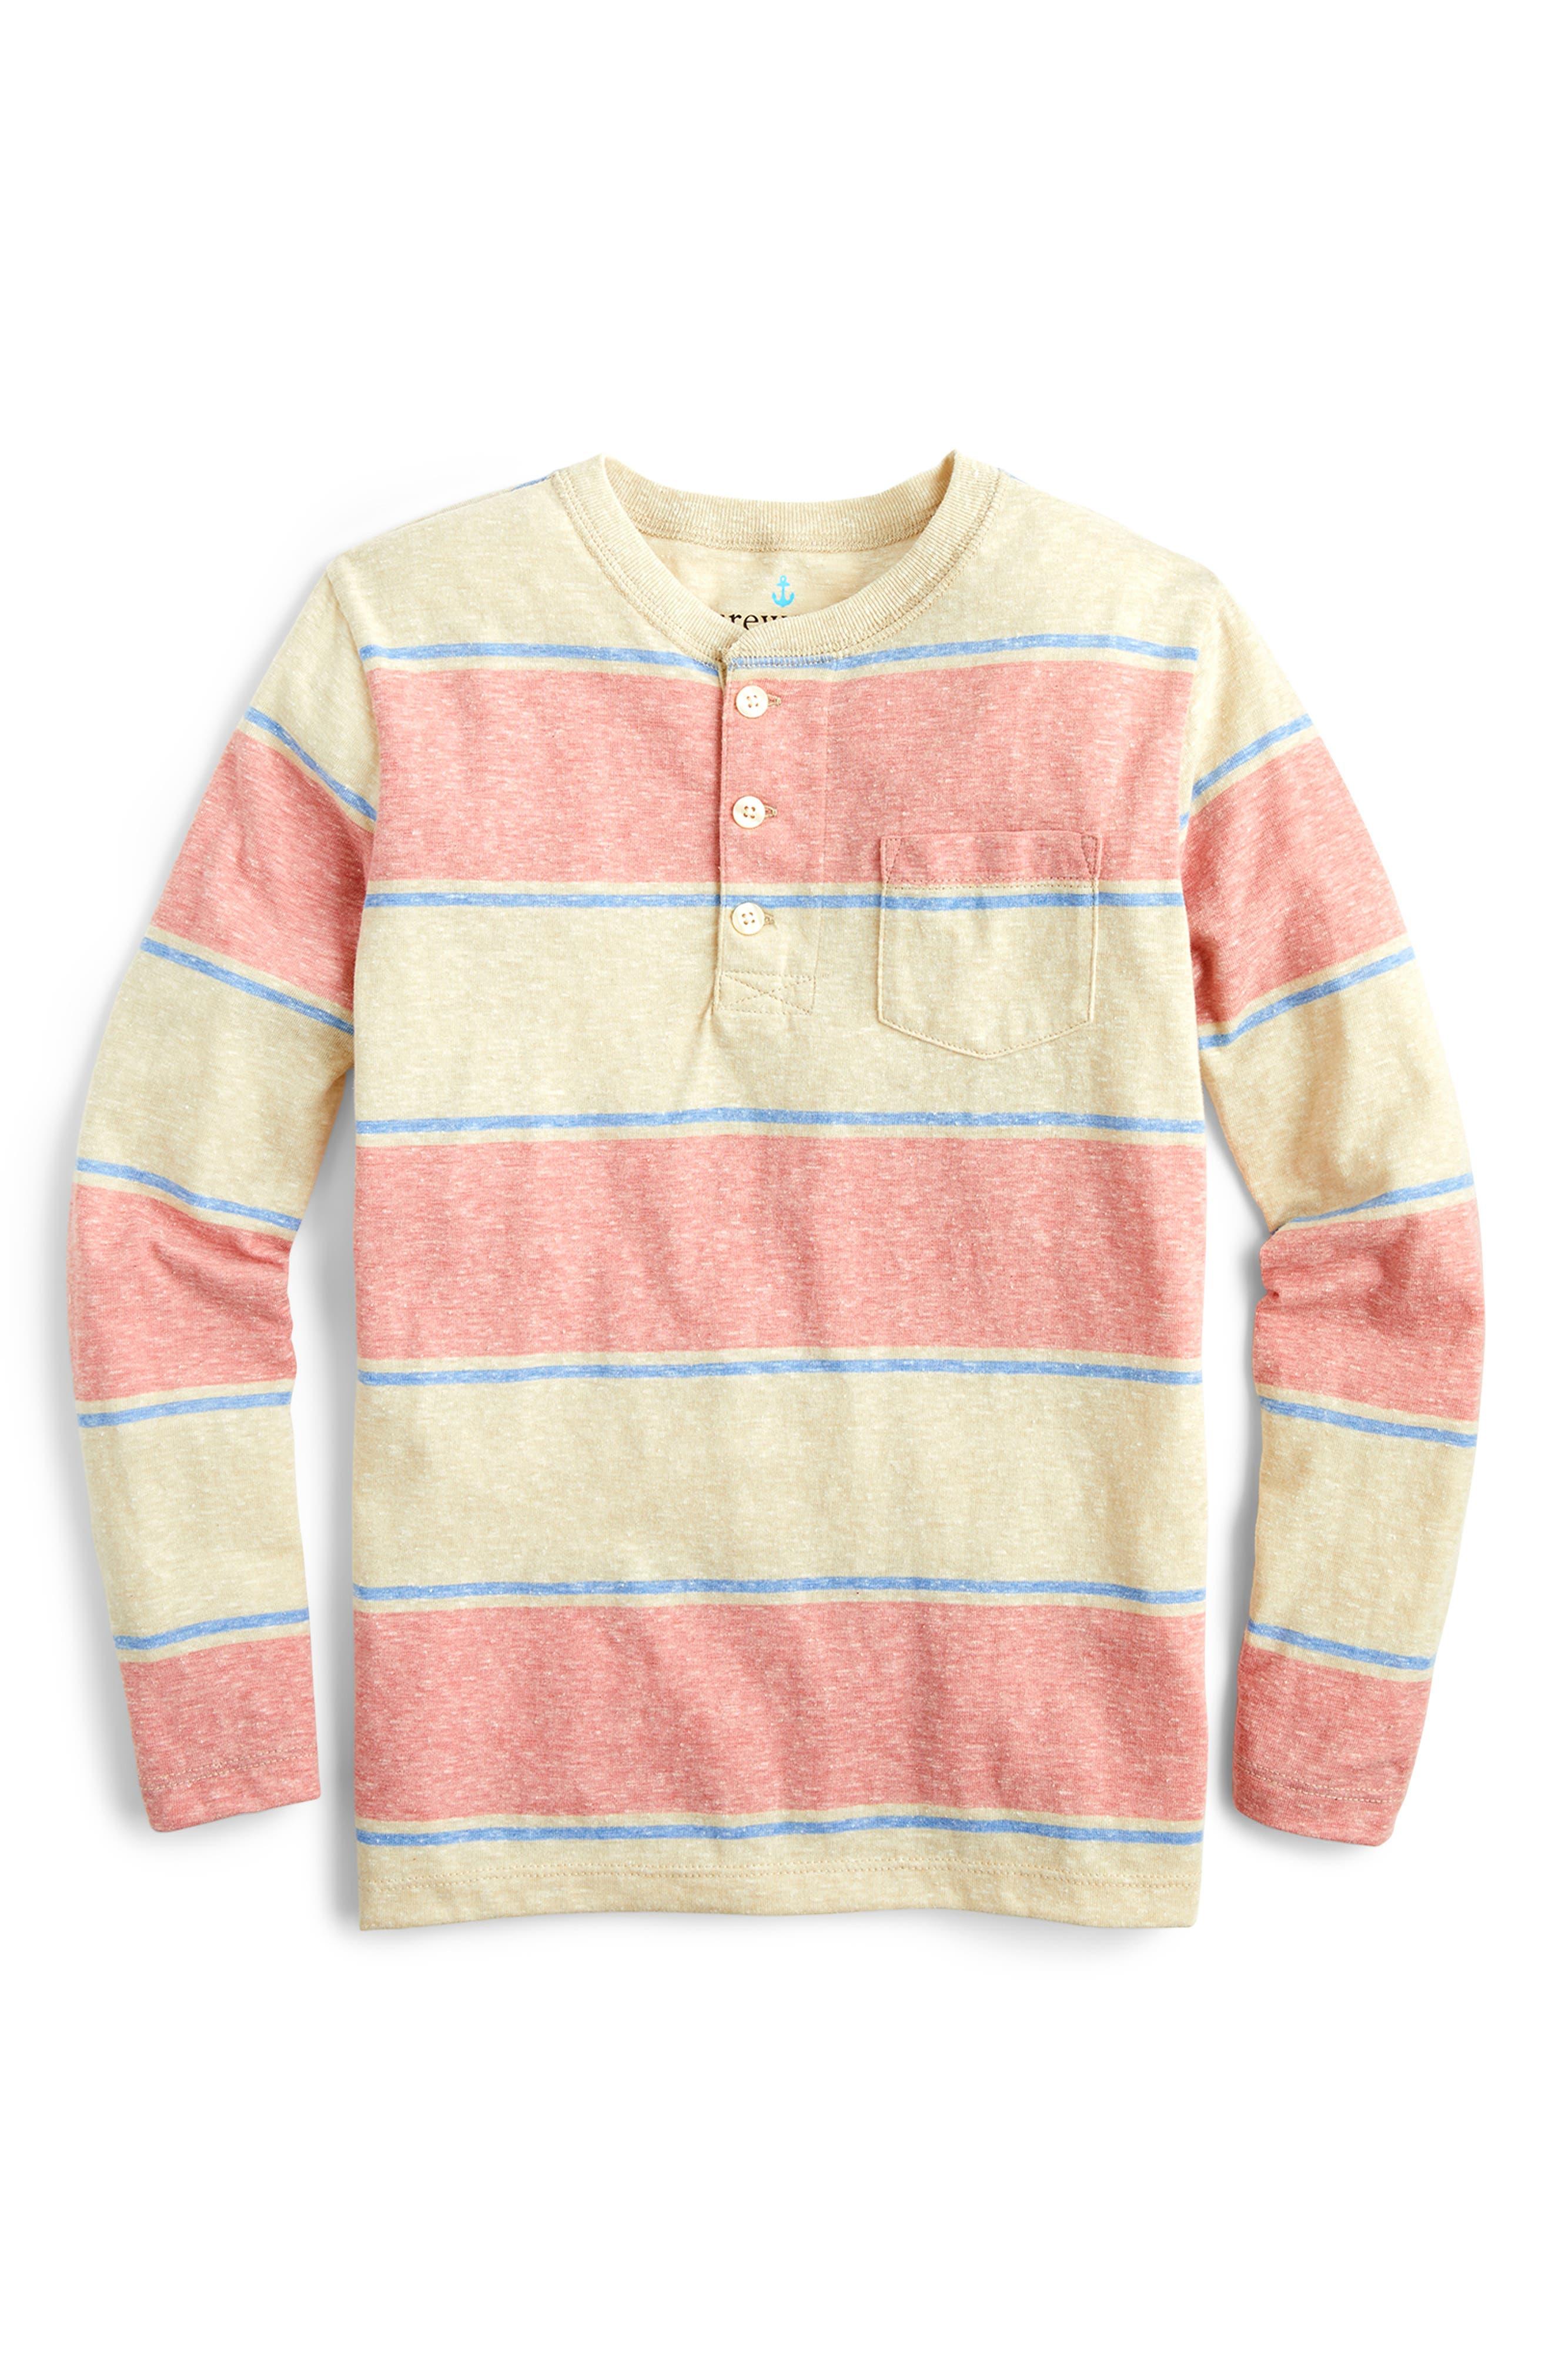 Boys Crewcuts By Jcrew Stripe Long Sleeve Henley Shirt Size 16  Red